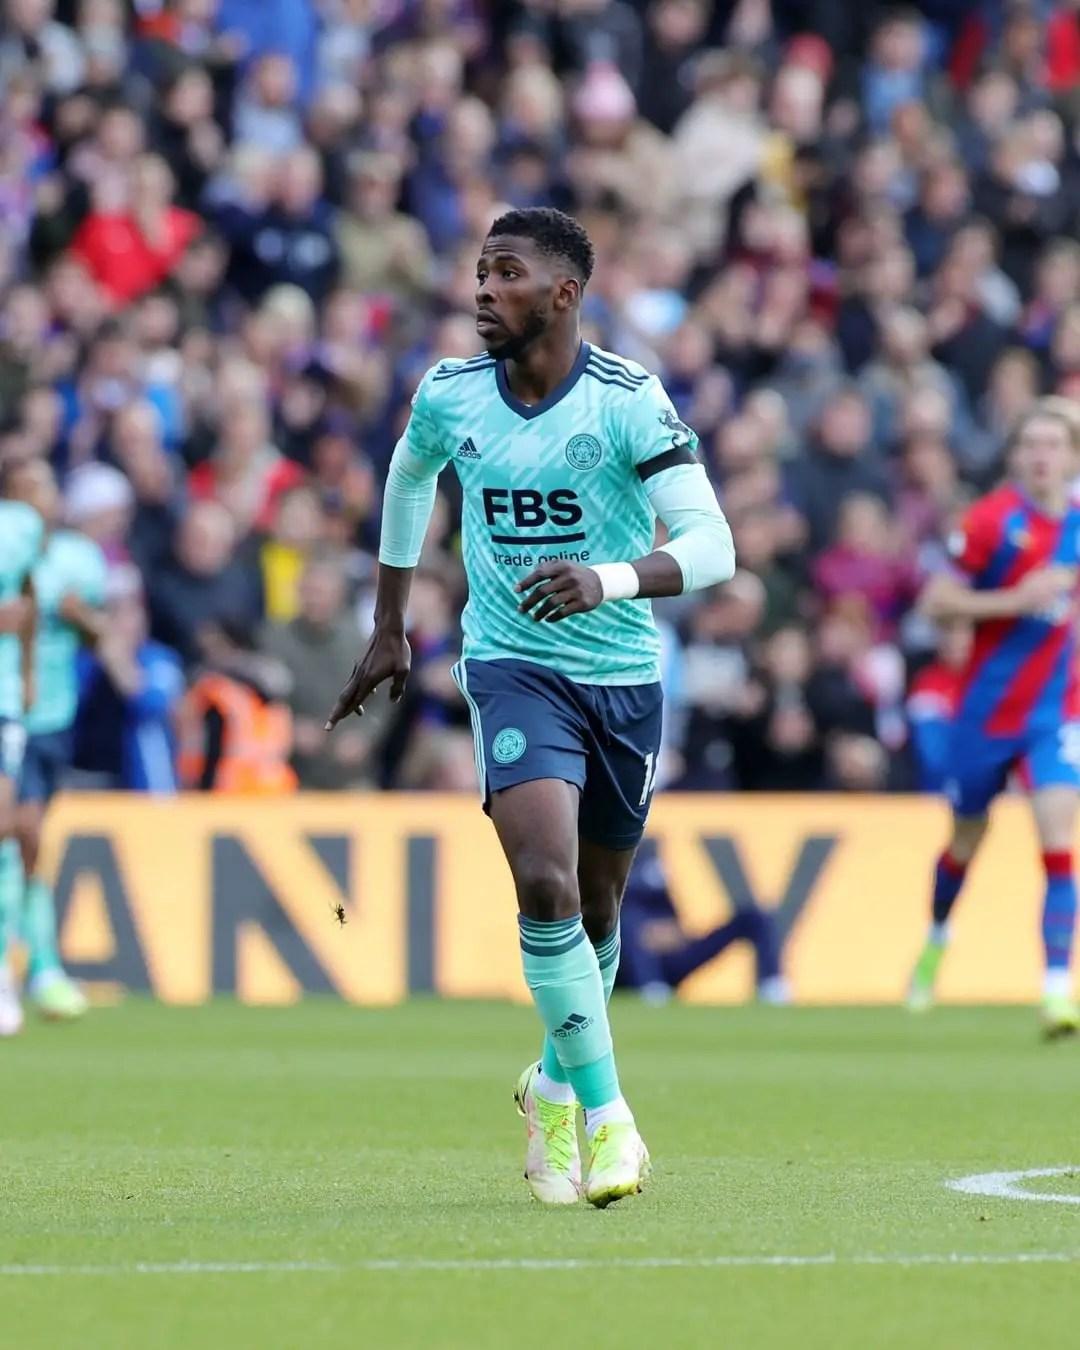 Iheanacho Equals  Okocha, Martins'  Premier League  Record After Scoring On His Birthday